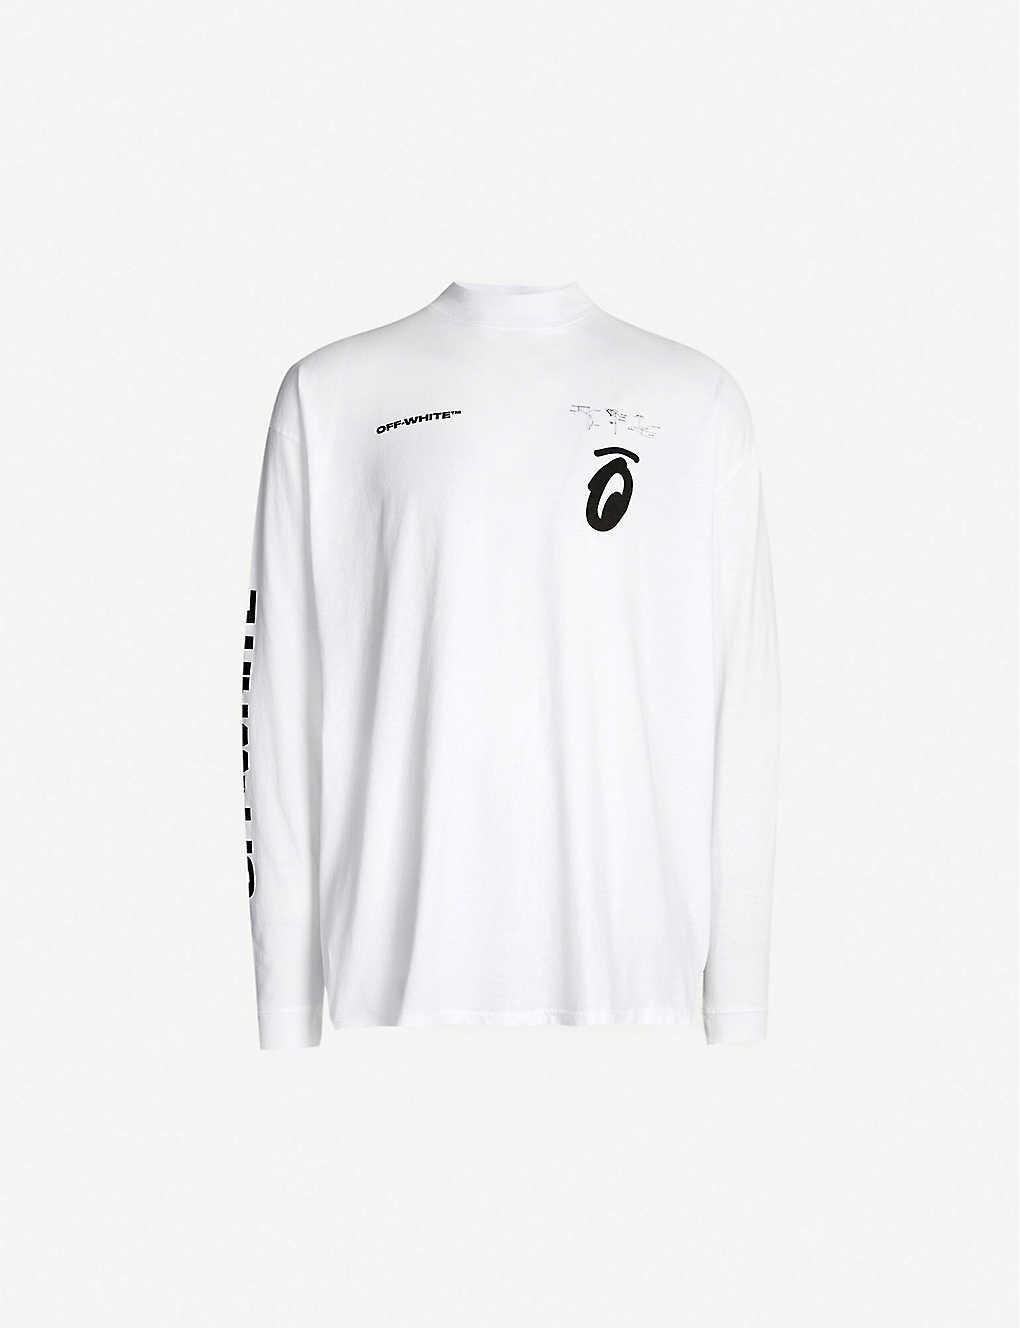 38bb7176e52 OFF-WHITE C/O VIRGIL ABLOH - Graphic-print cotton-jersey top ...